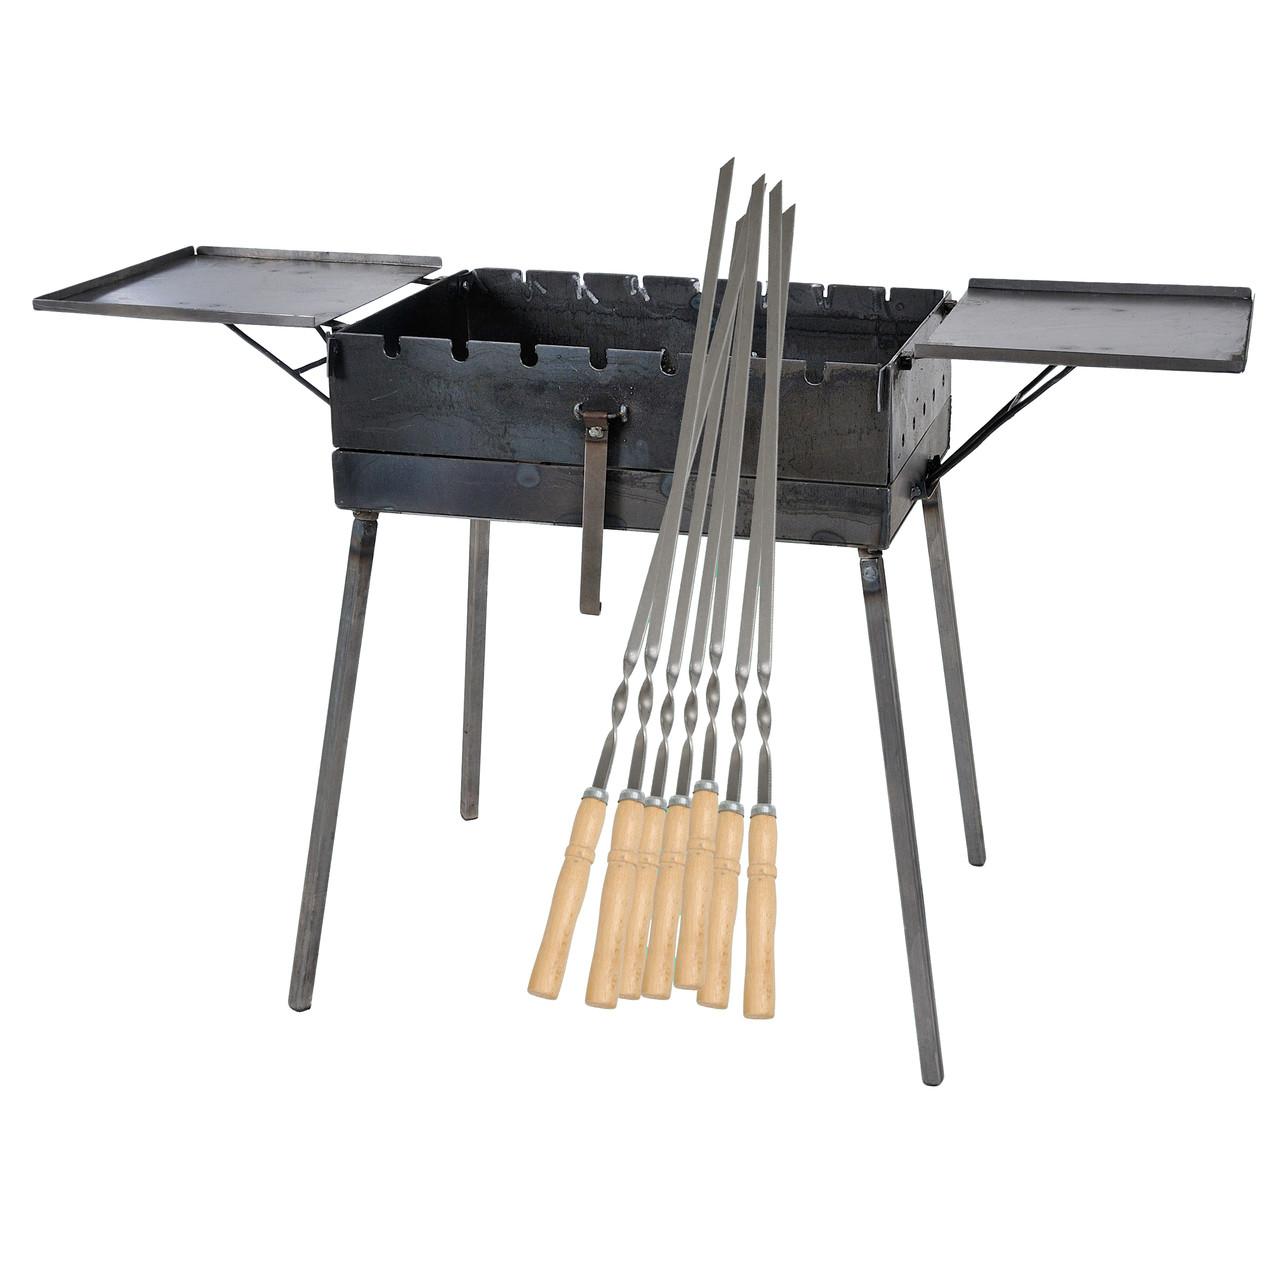 Мангал - валіза 3 мм на 7 шампурів зі столиками 550х300х150мм + Набір шампурів